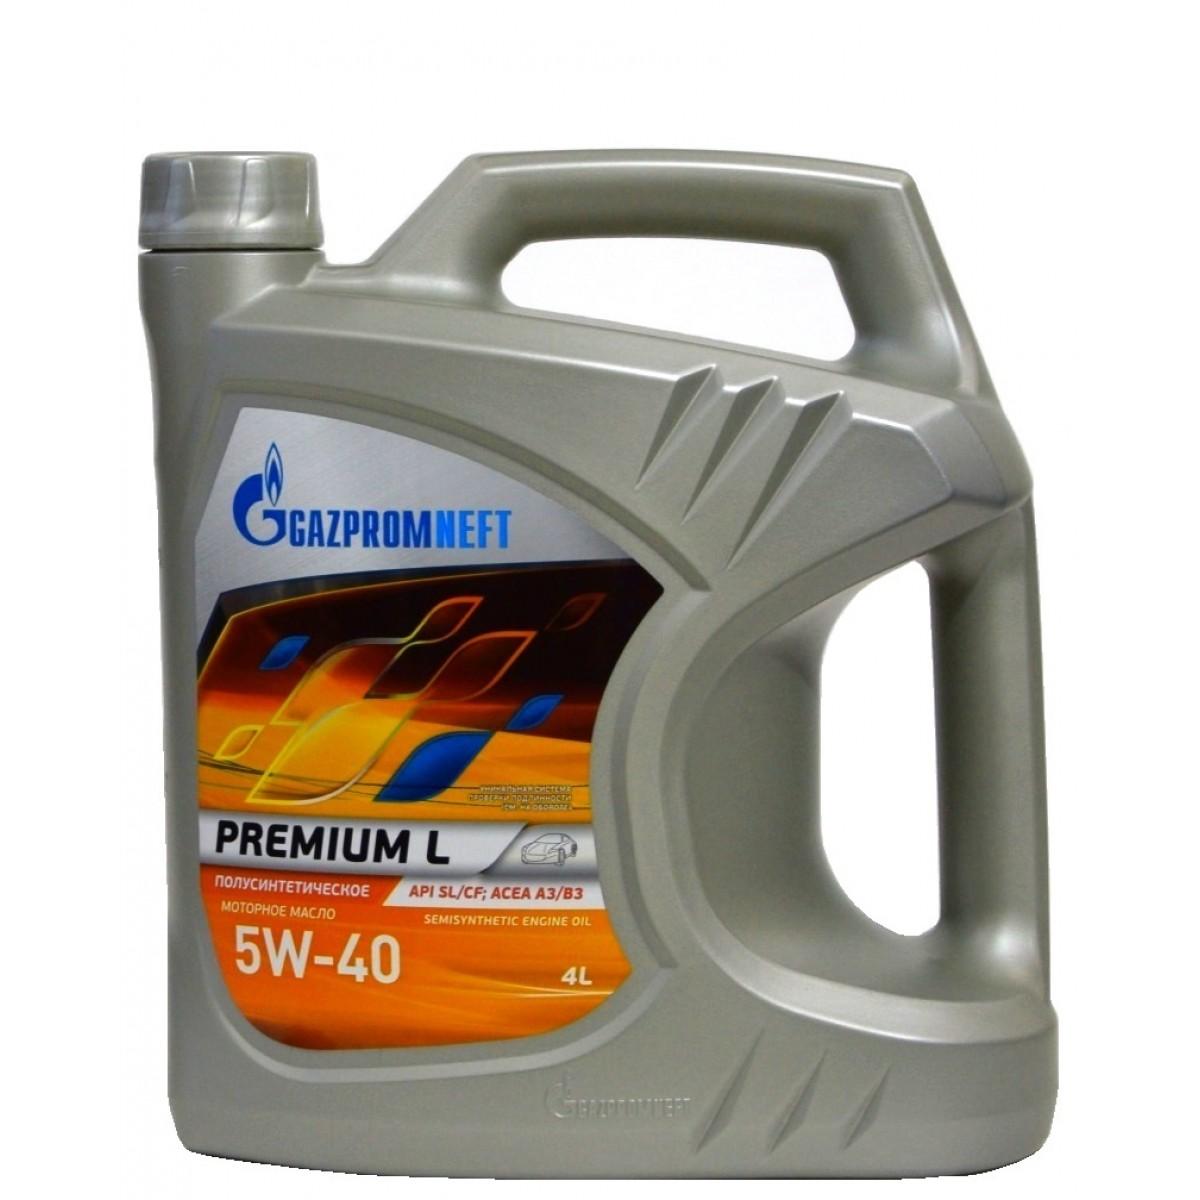 Gazpromneft Premium L, 5W-40, SL/CF, полусинтетика, 4л, Россия